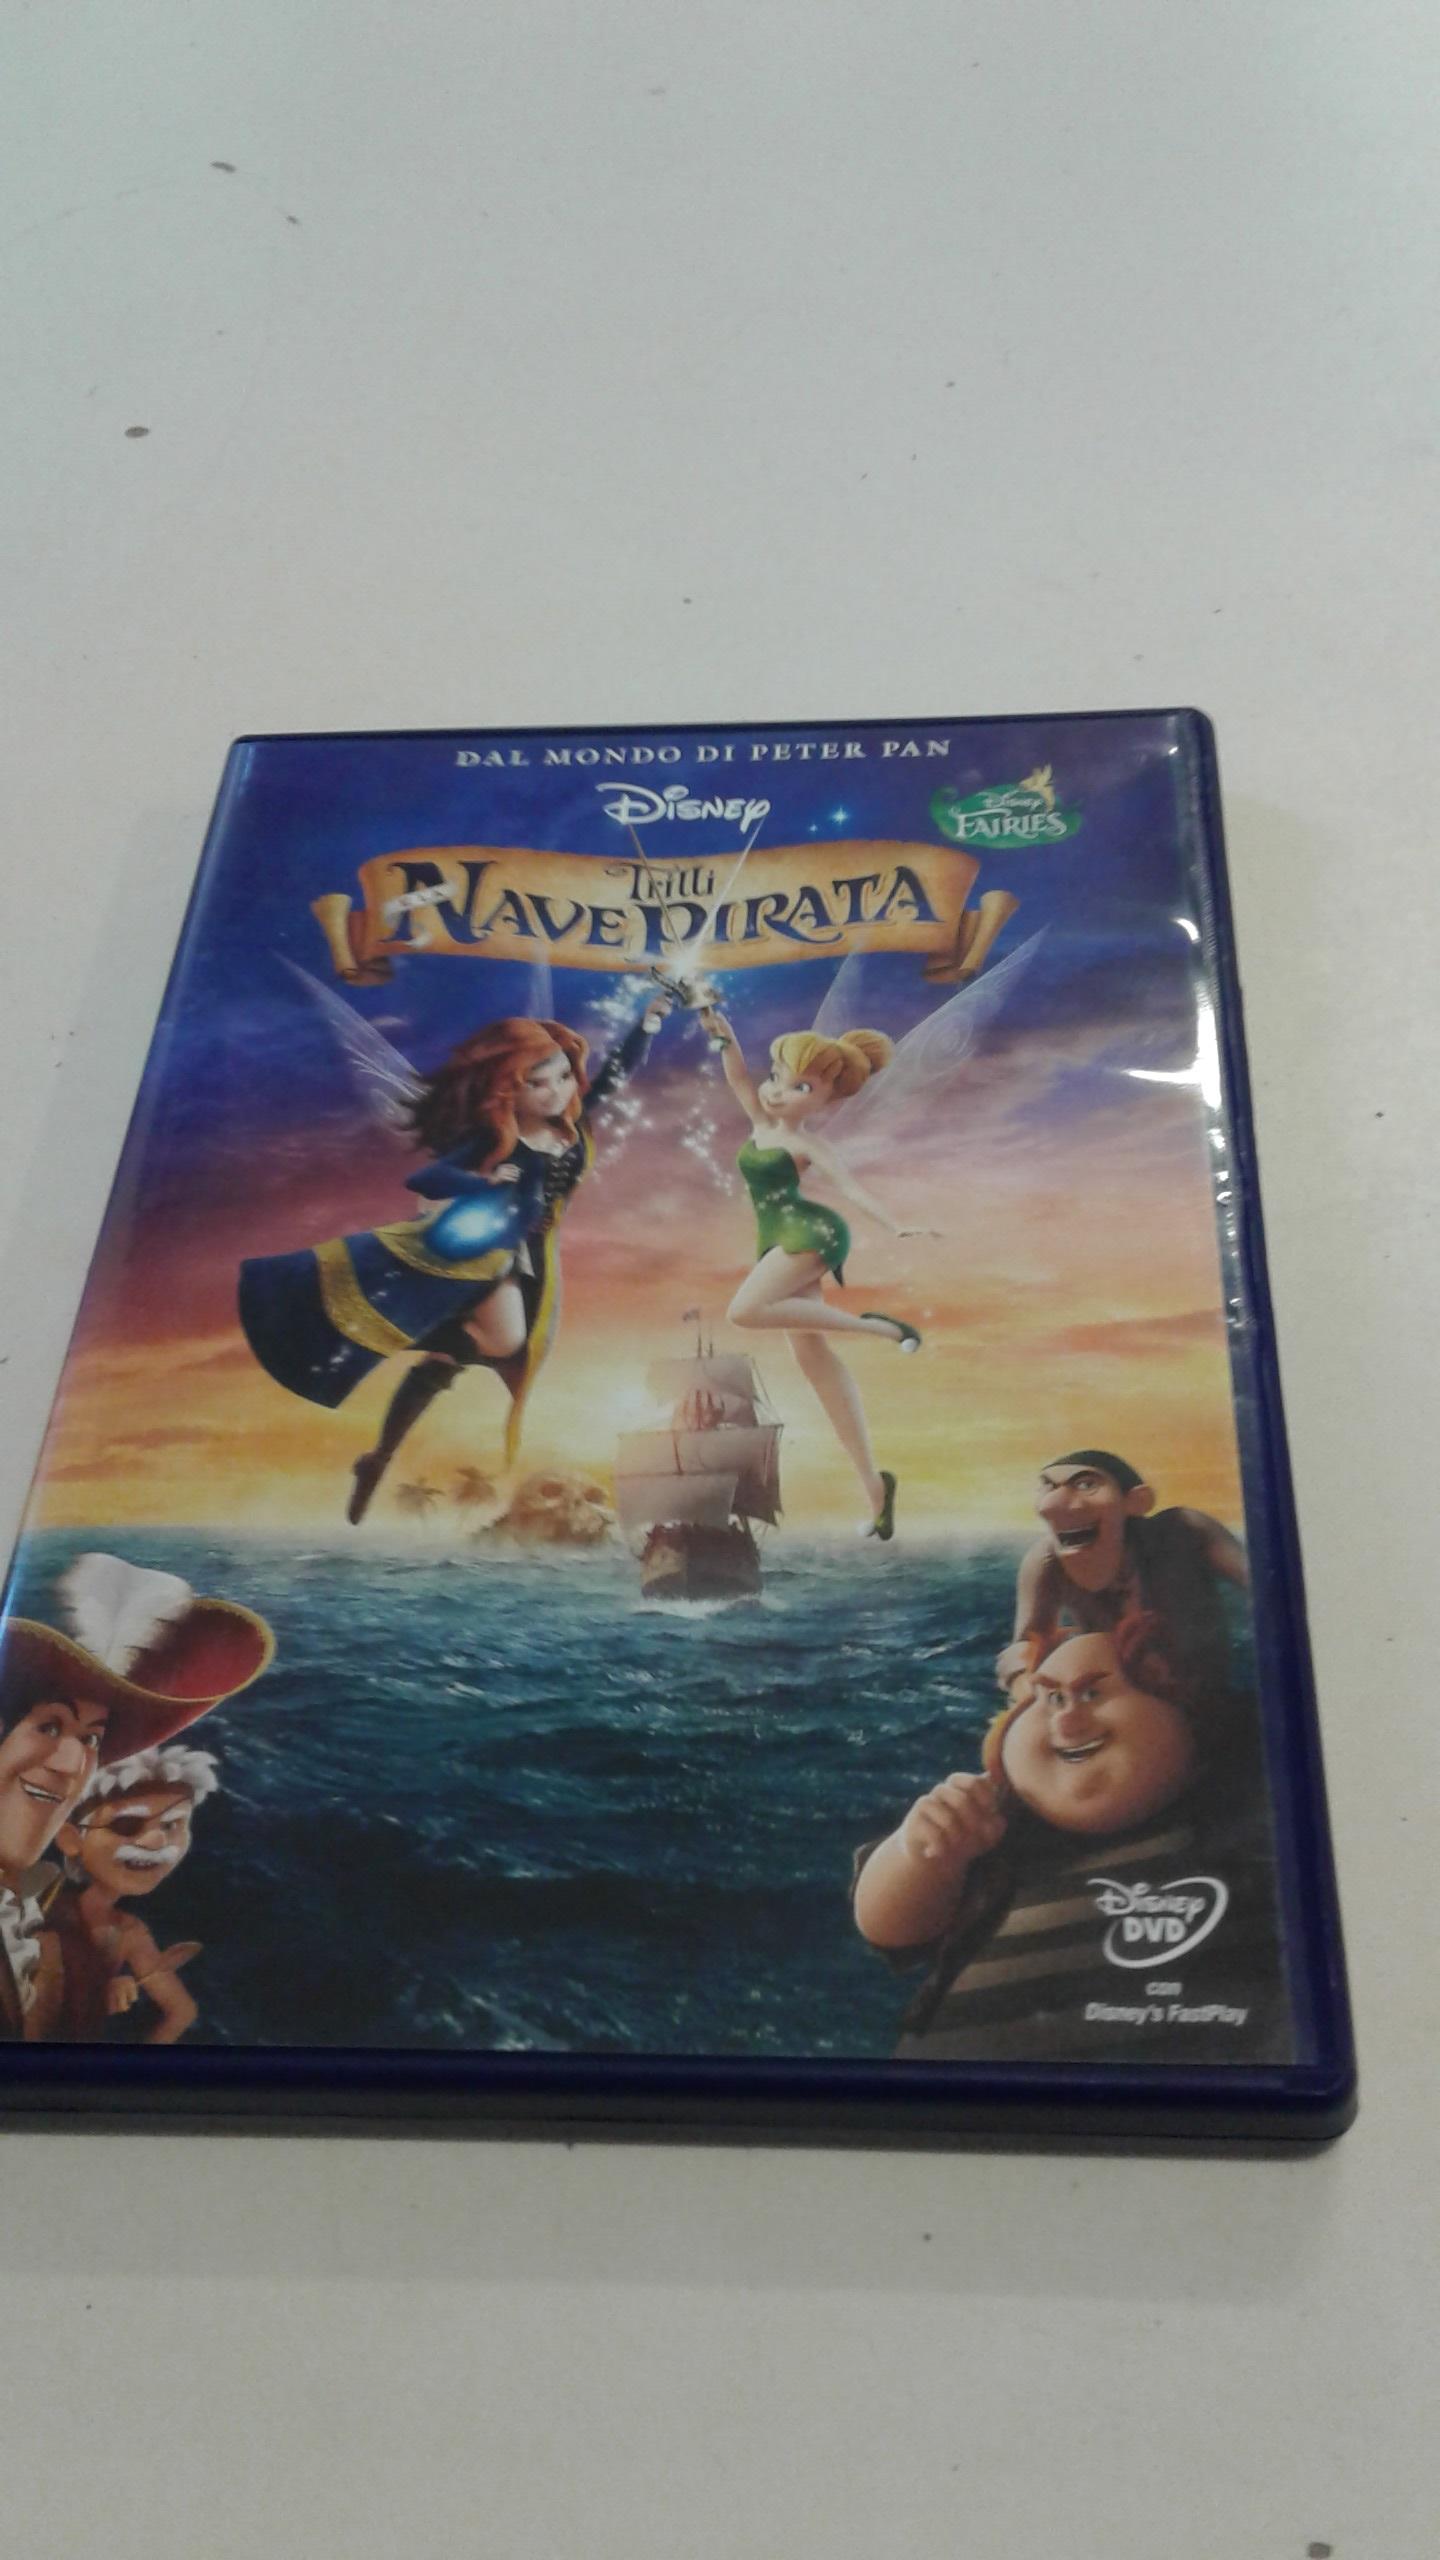 DVD Disney Trilli la nave pirata